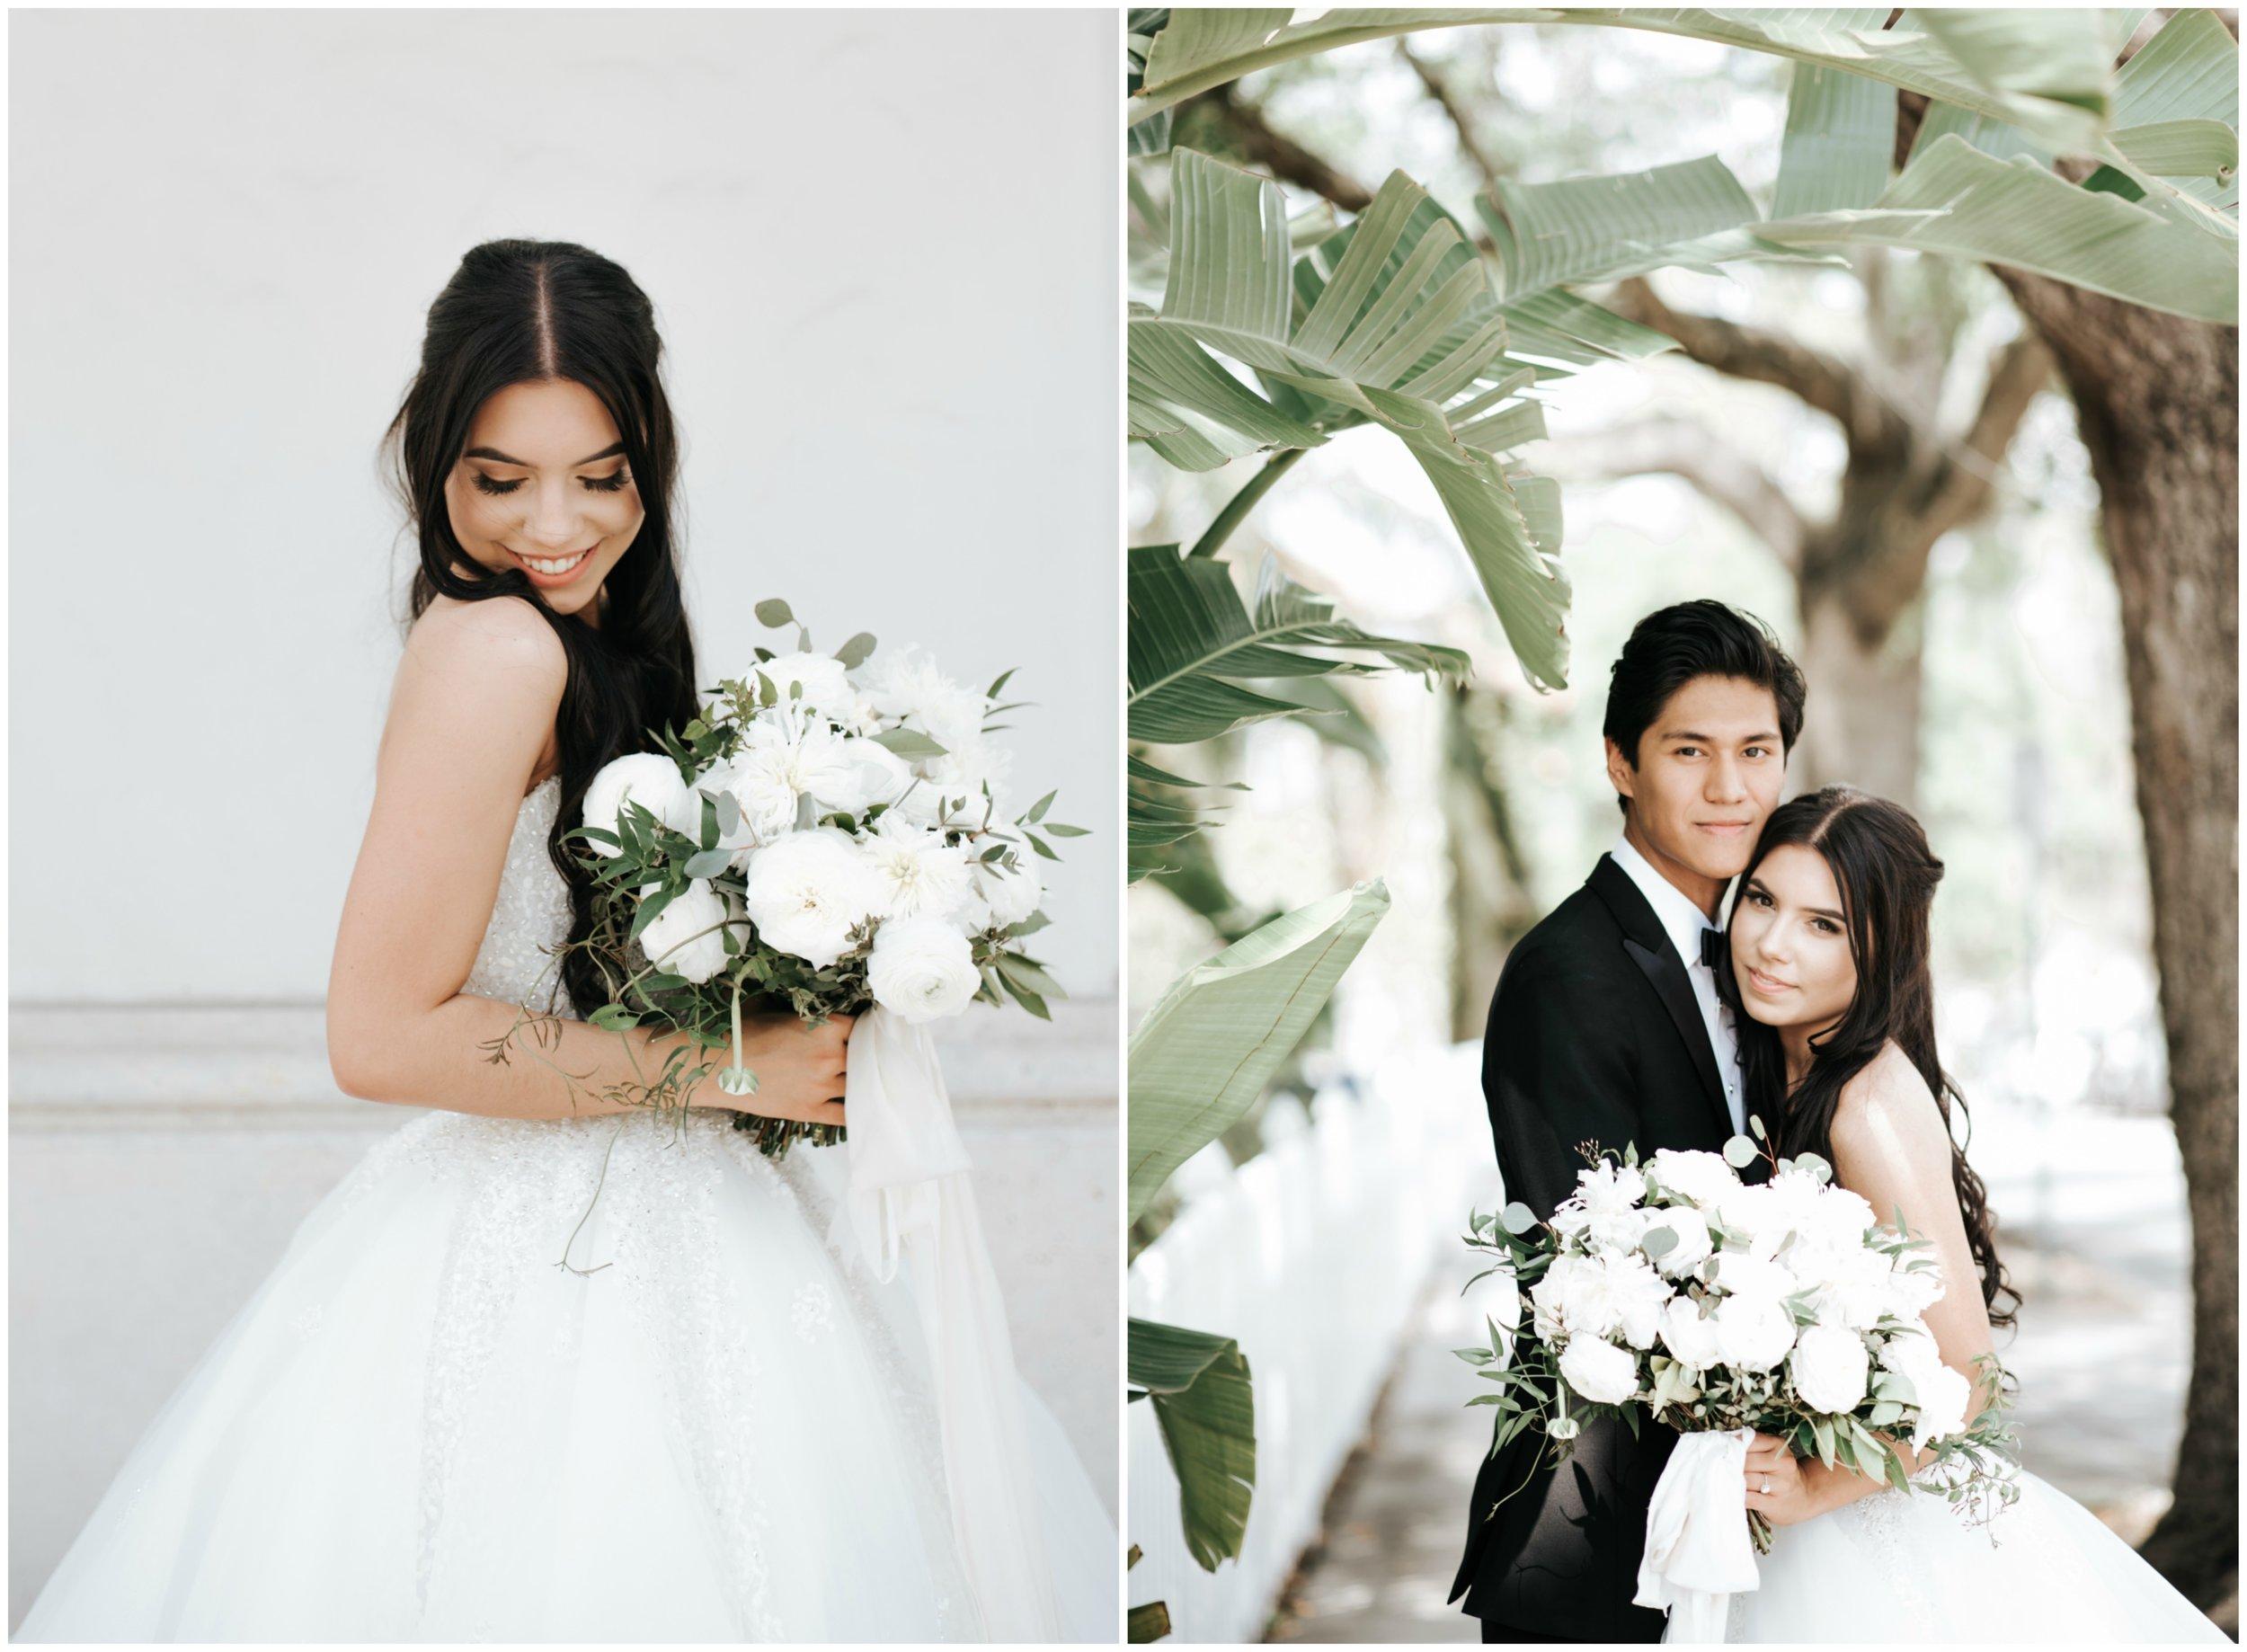 taylor-miguel-wedding-lake-mary-portraits.jpg